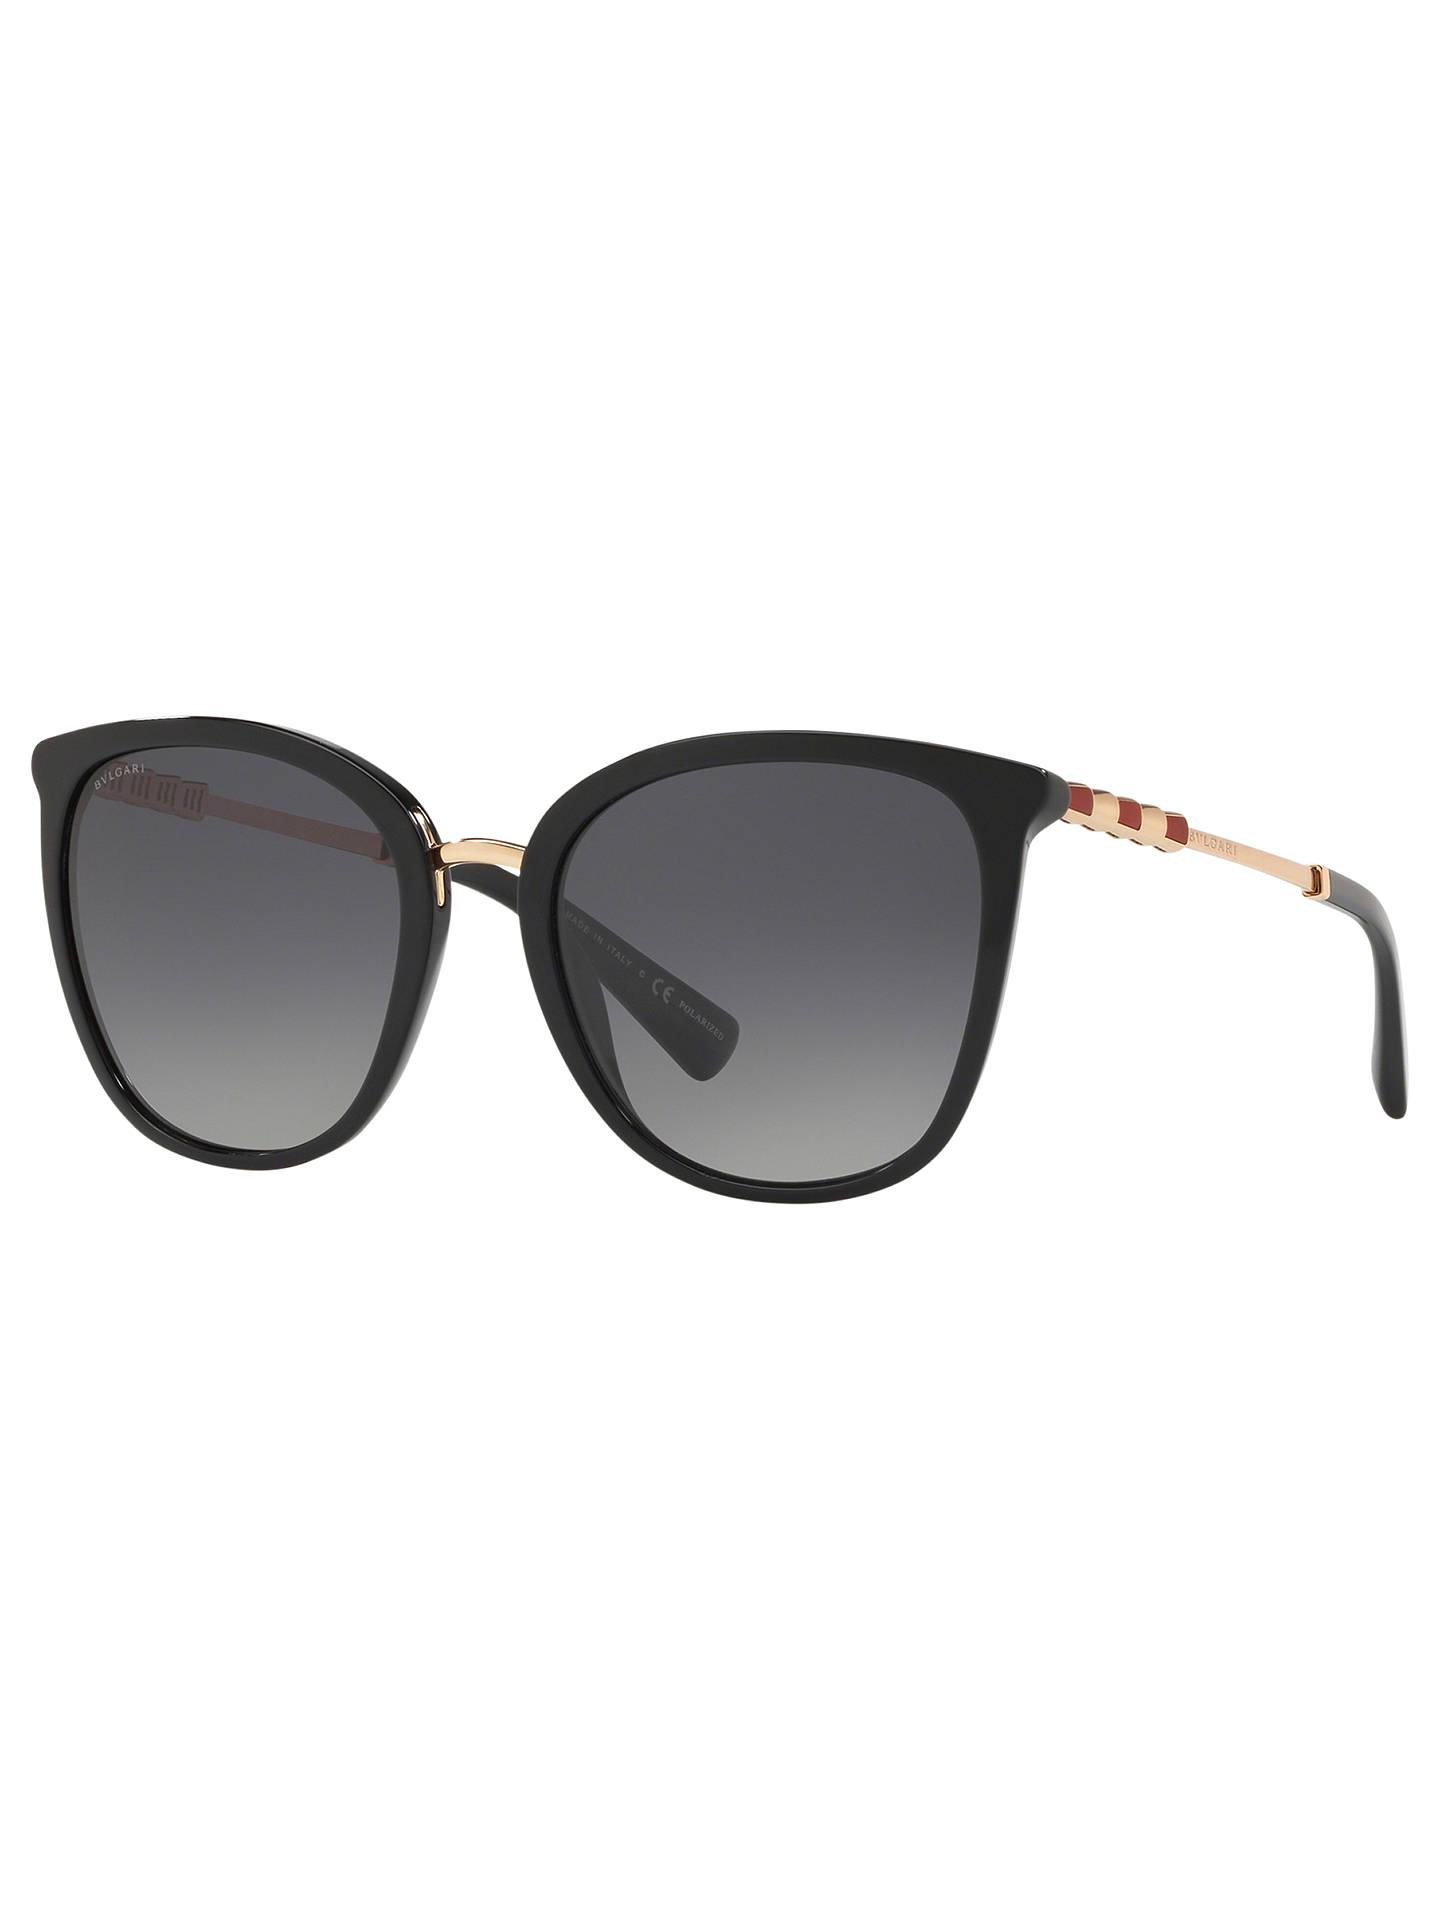 049dec3aac Buy BVLGARI BV8205KB Women s Polarised Oval Sunglasses